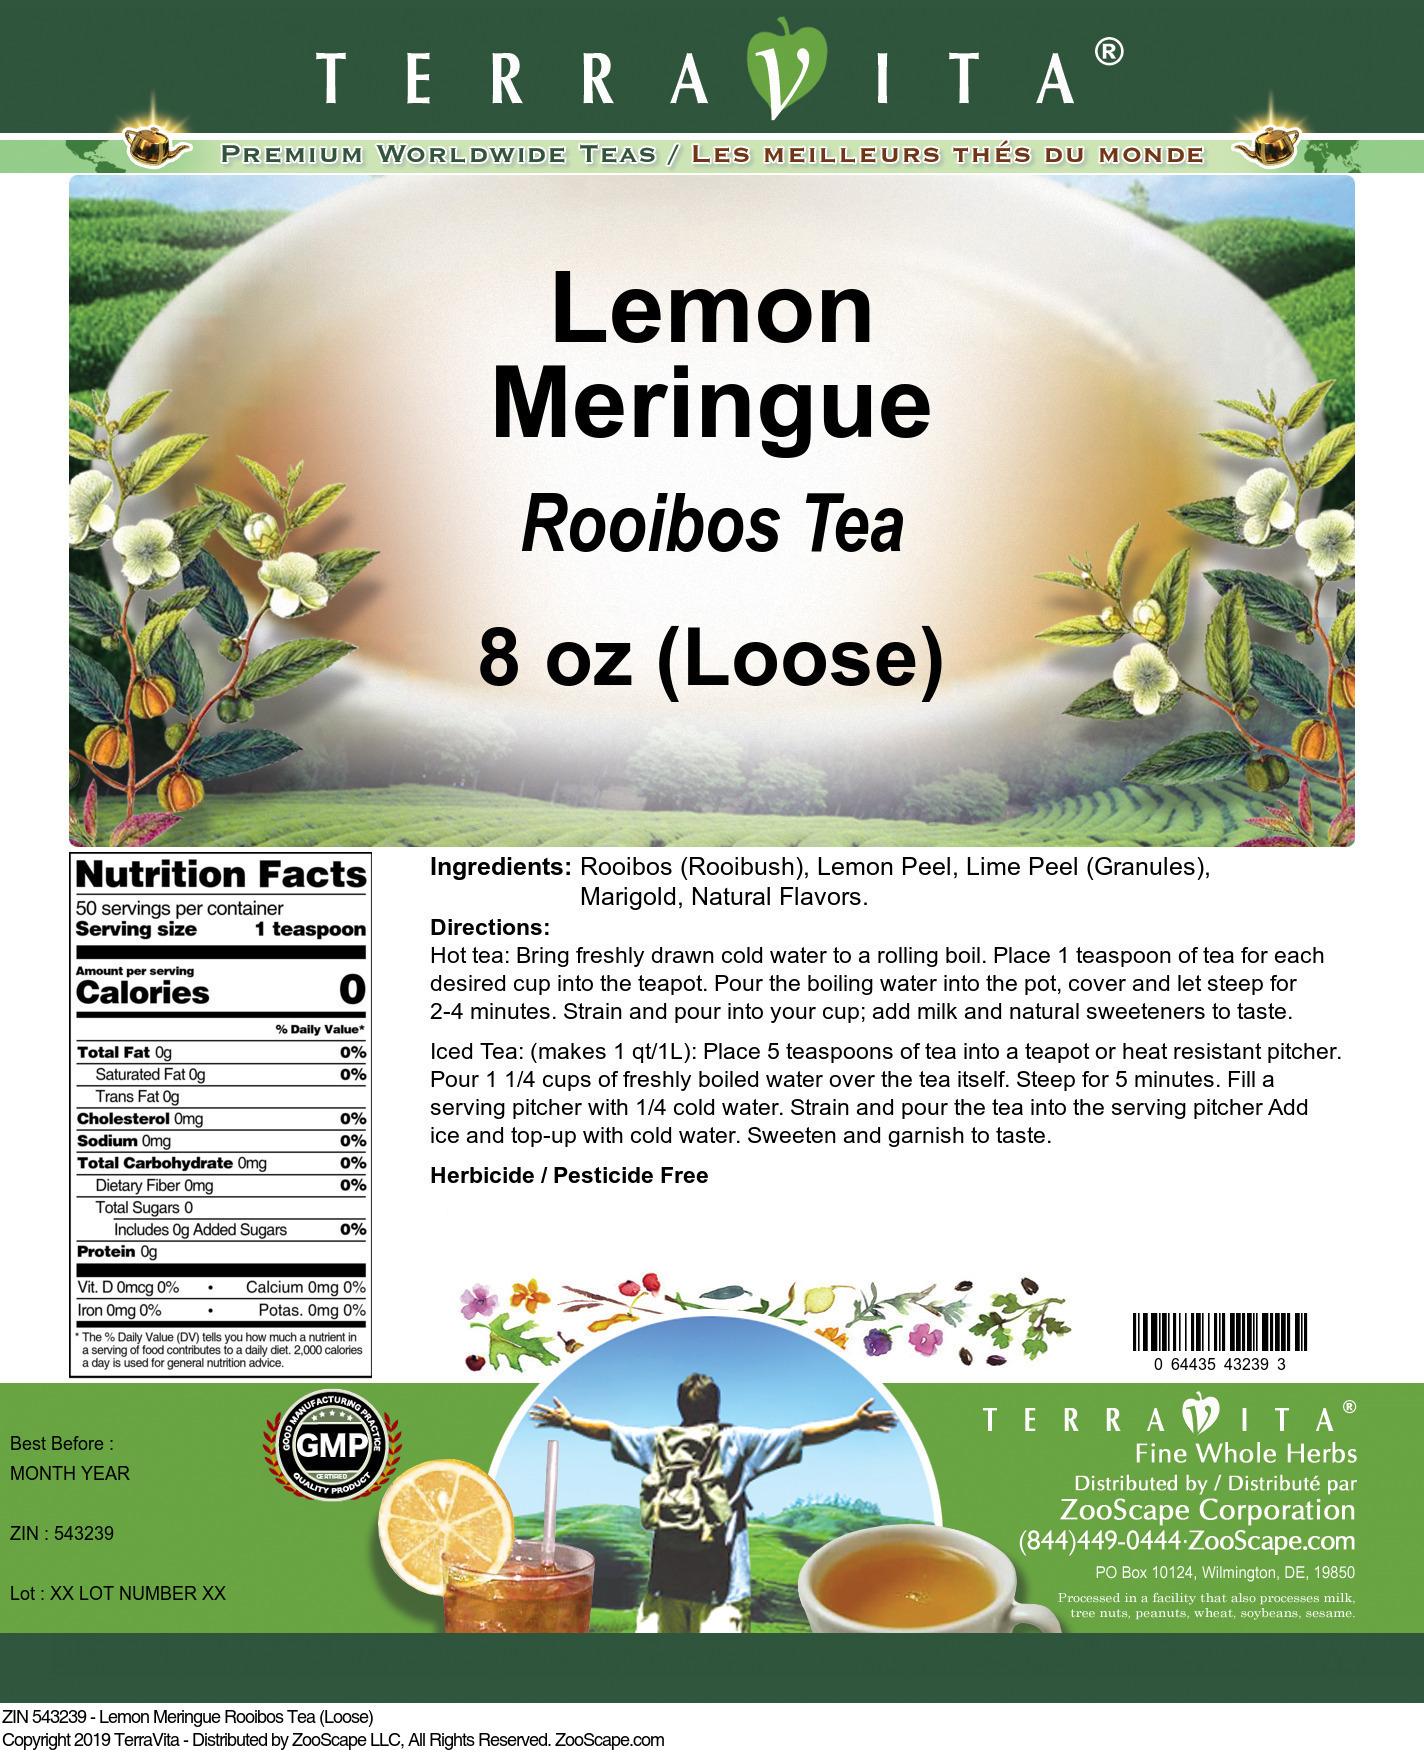 Lemon Meringue Rooibos Tea